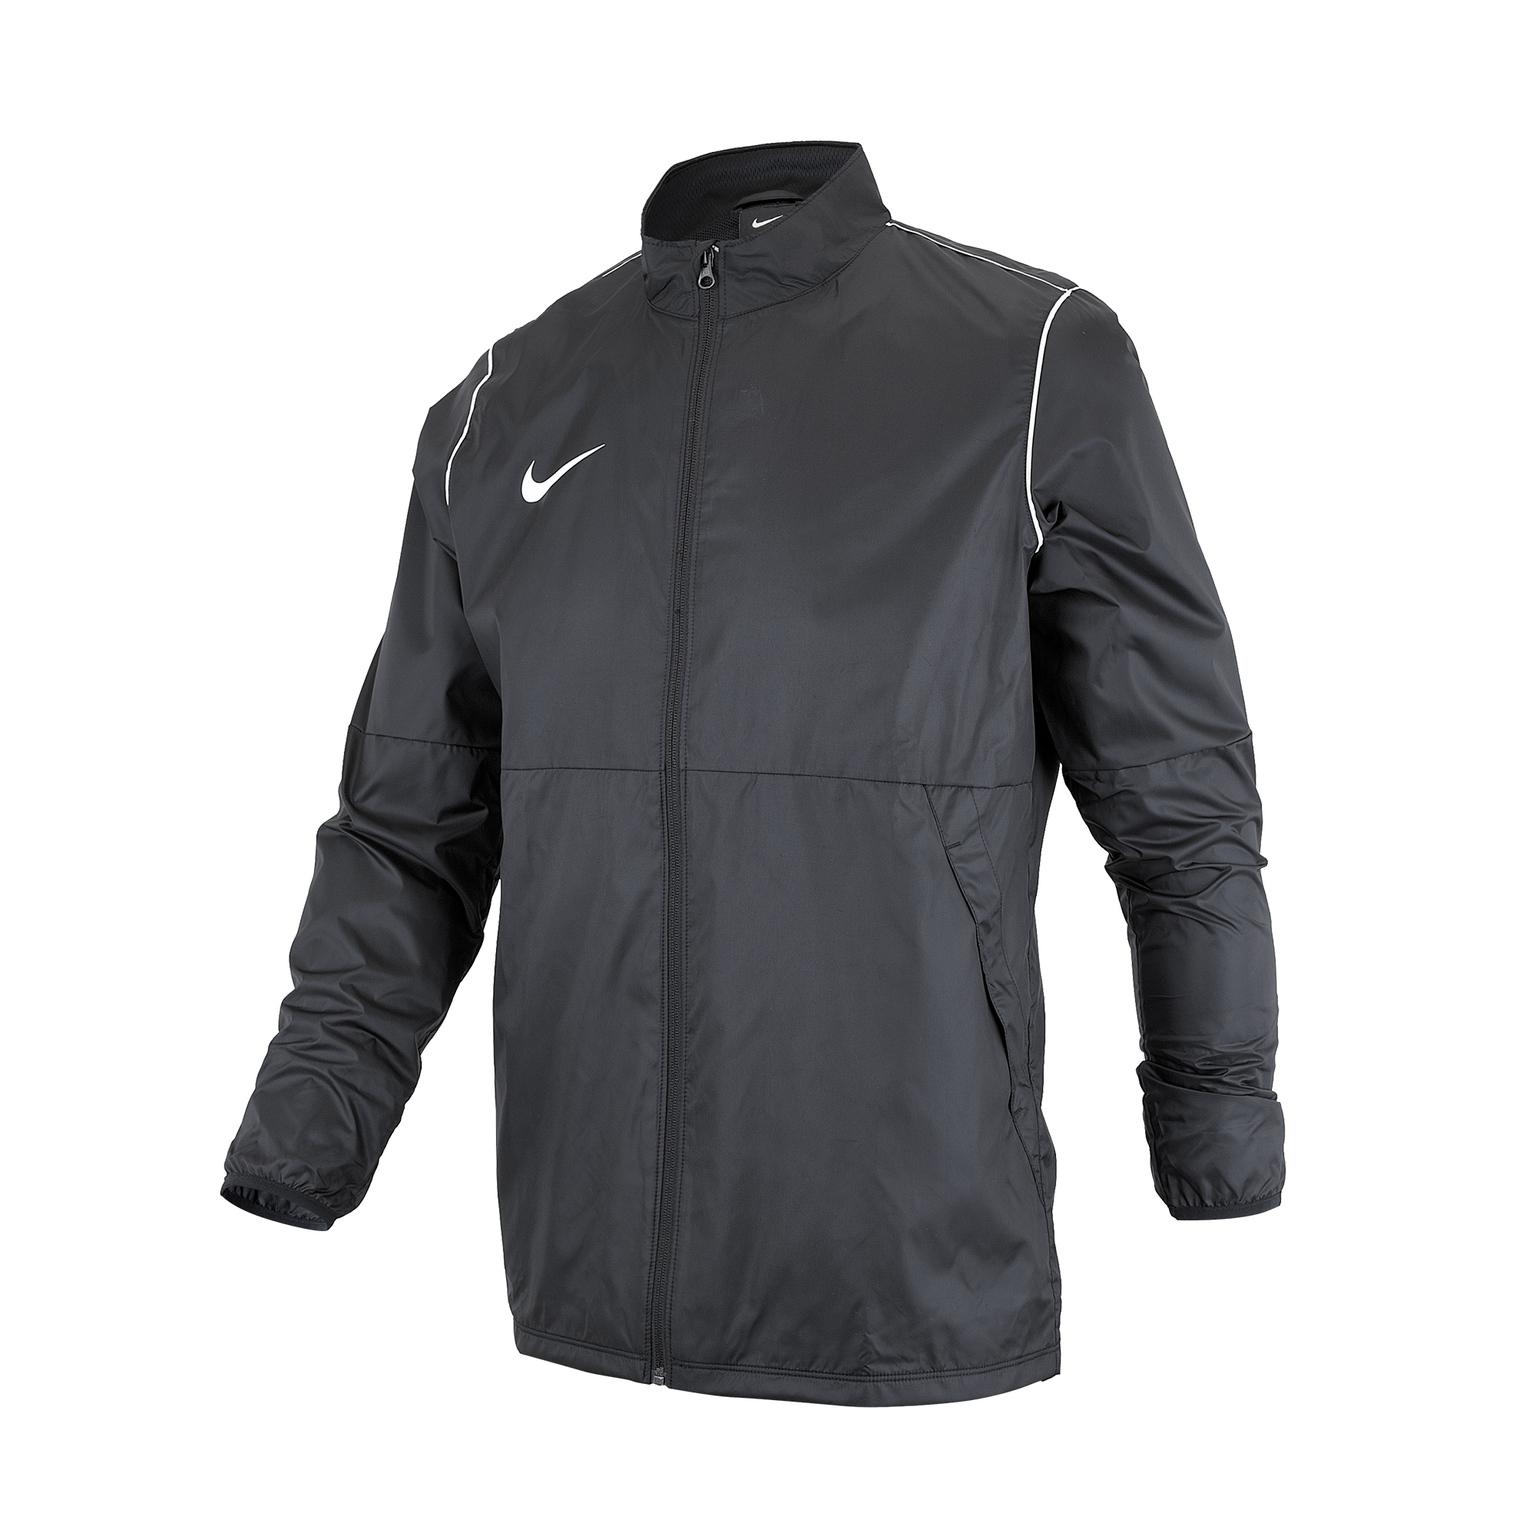 Ветровка Nike RPL Park20 Rain Jacket BV6881-010